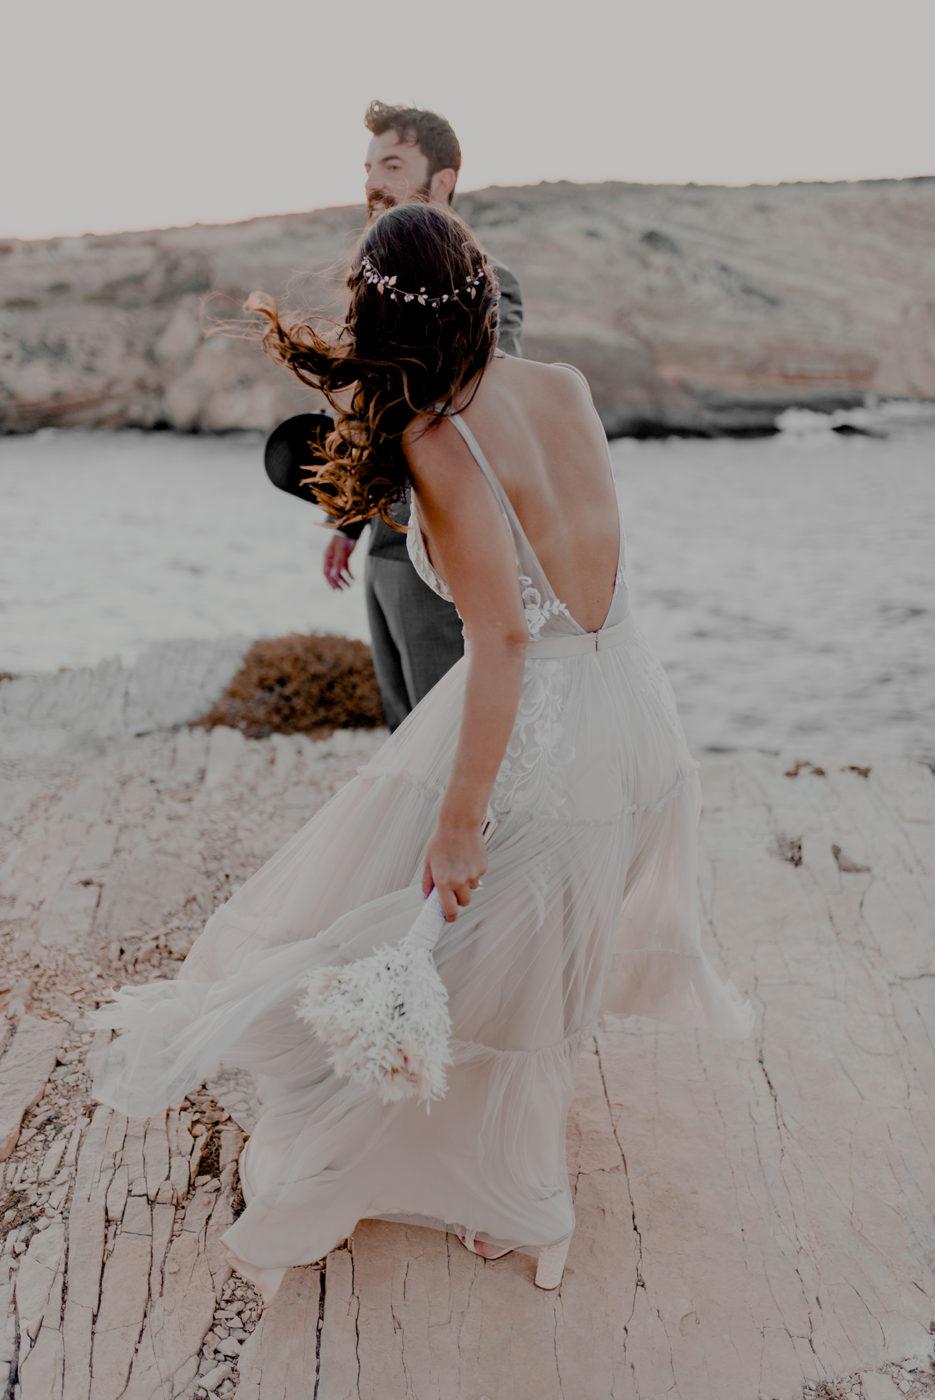 kirill-samarits-wedding-photography-koufonisia-greece-couple-photographer (38)